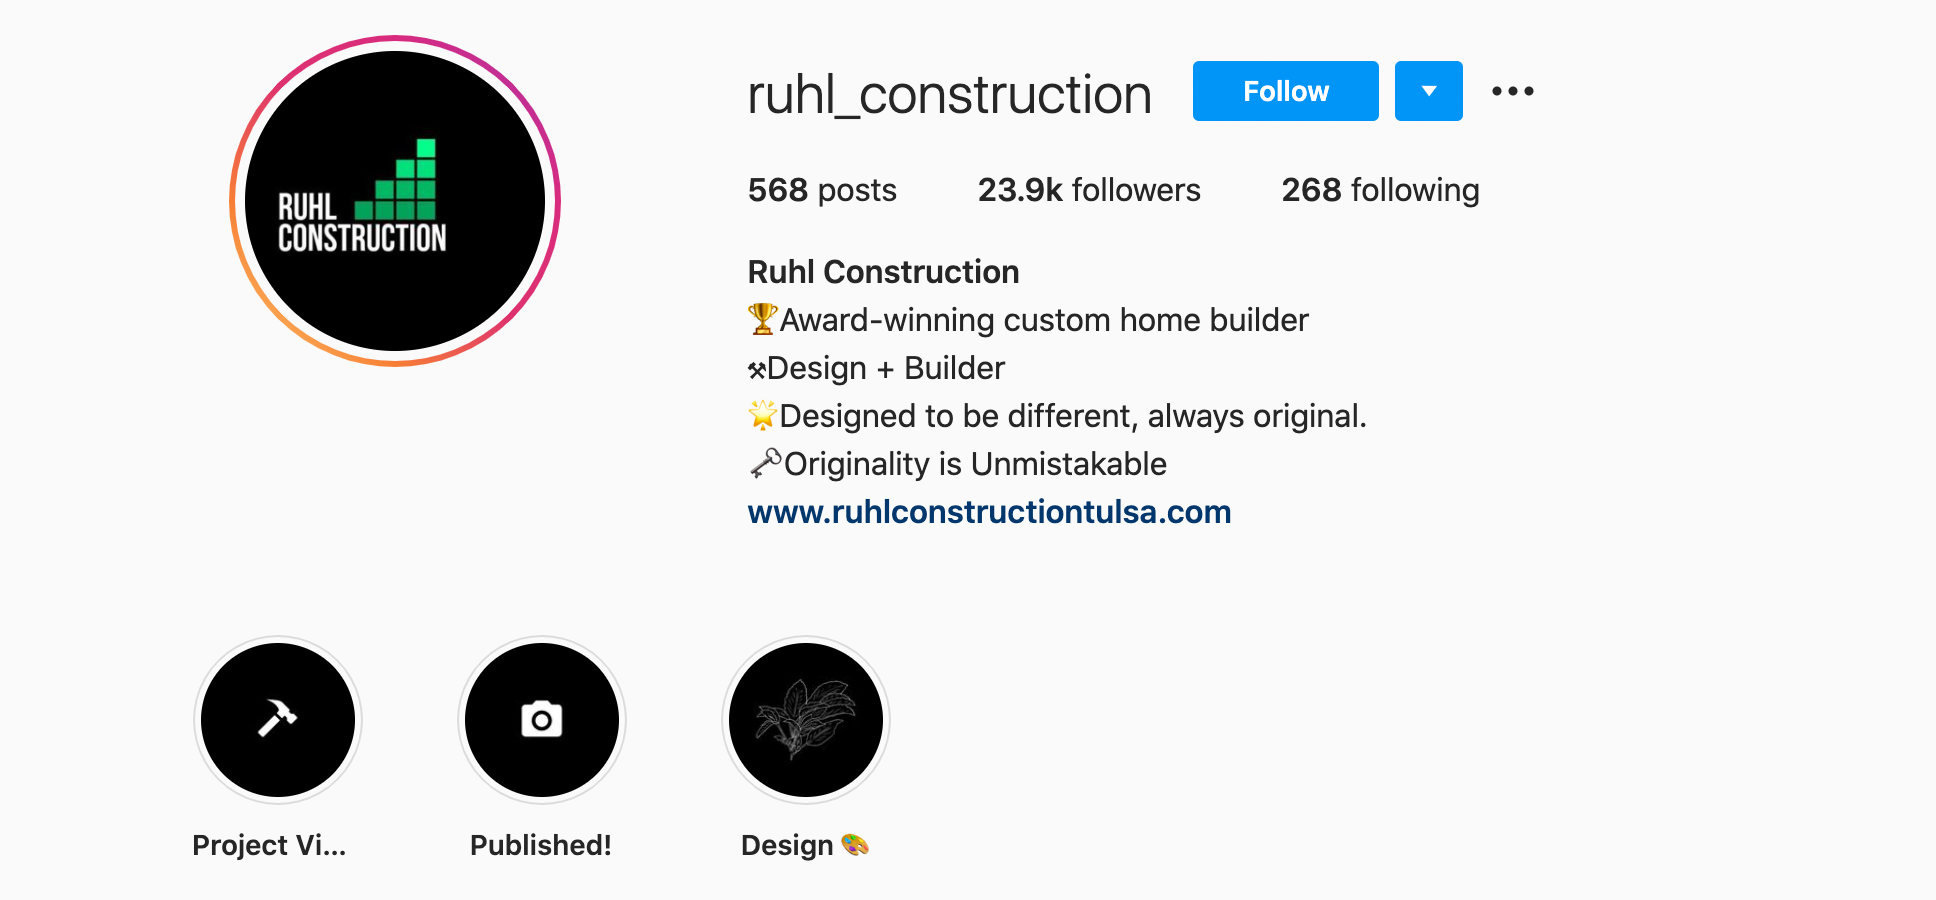 ruhl-construction-instagram-profile